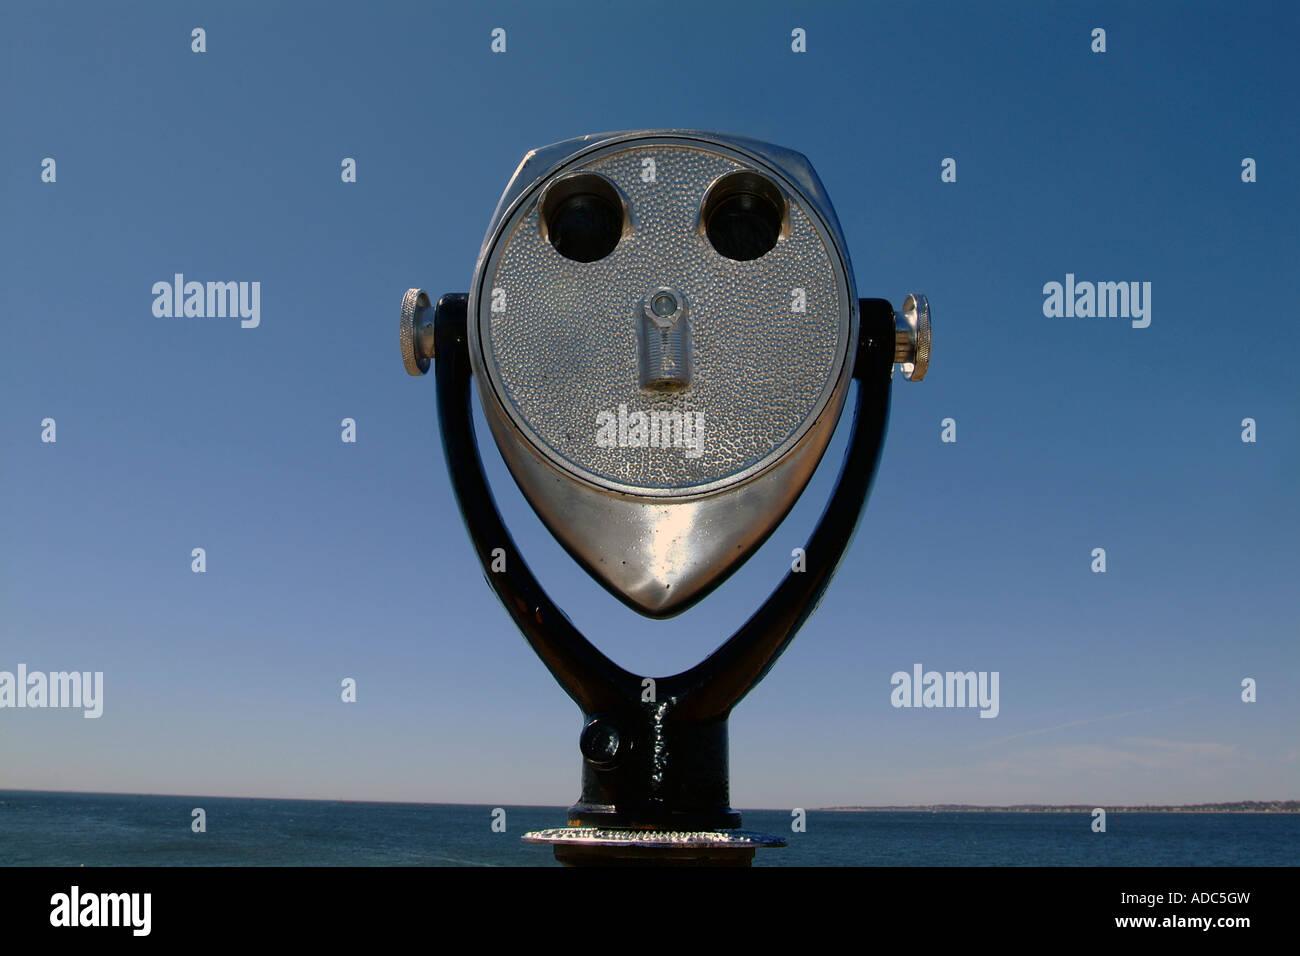 Coin Operated Binoculars - Stock Image